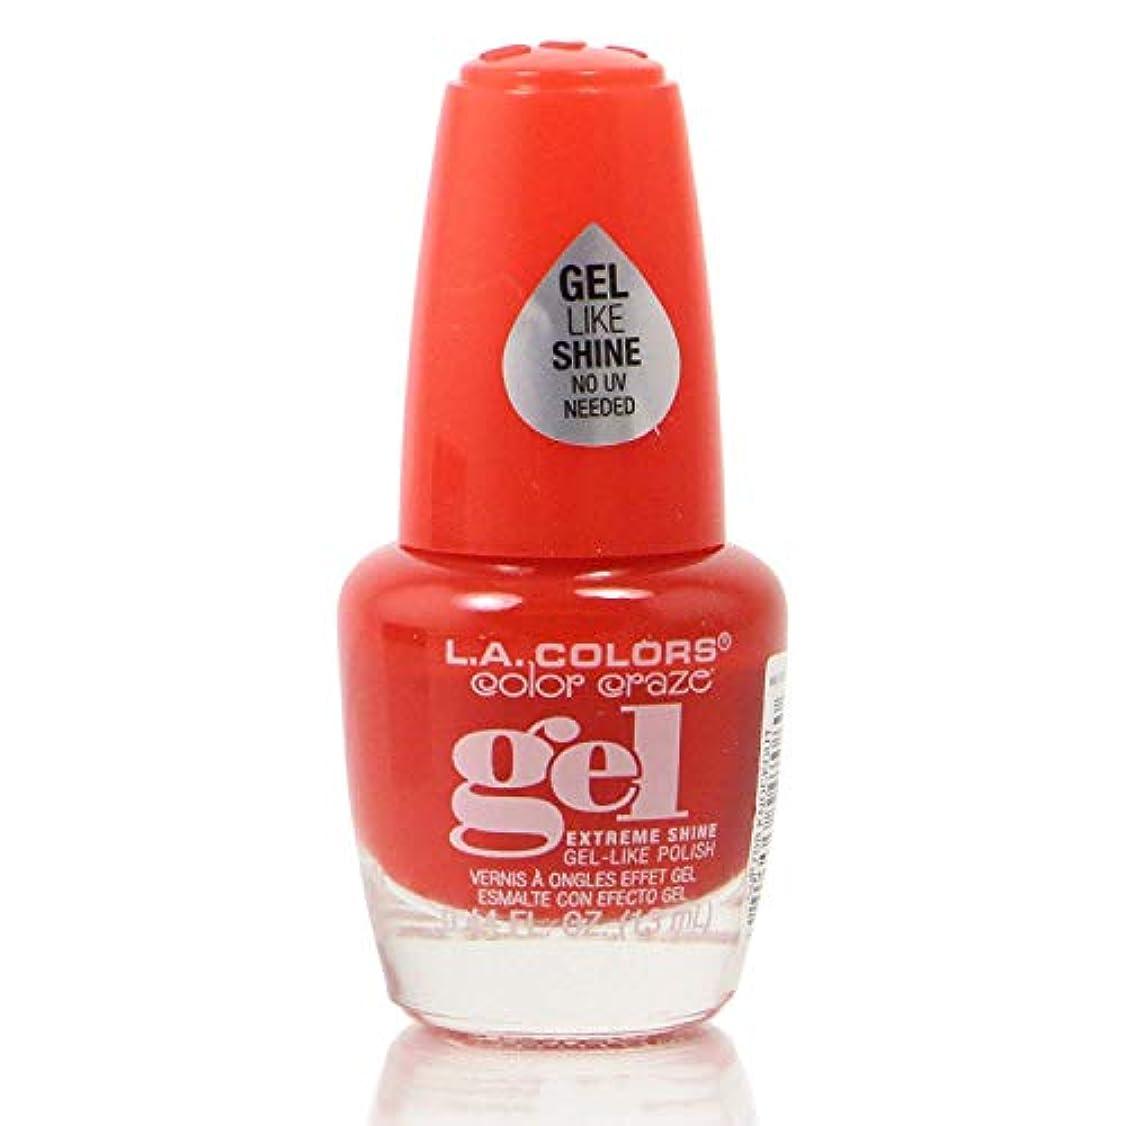 休日に委託戦術LA Colors 美容化粧品21 Cnp708美容化粧品21